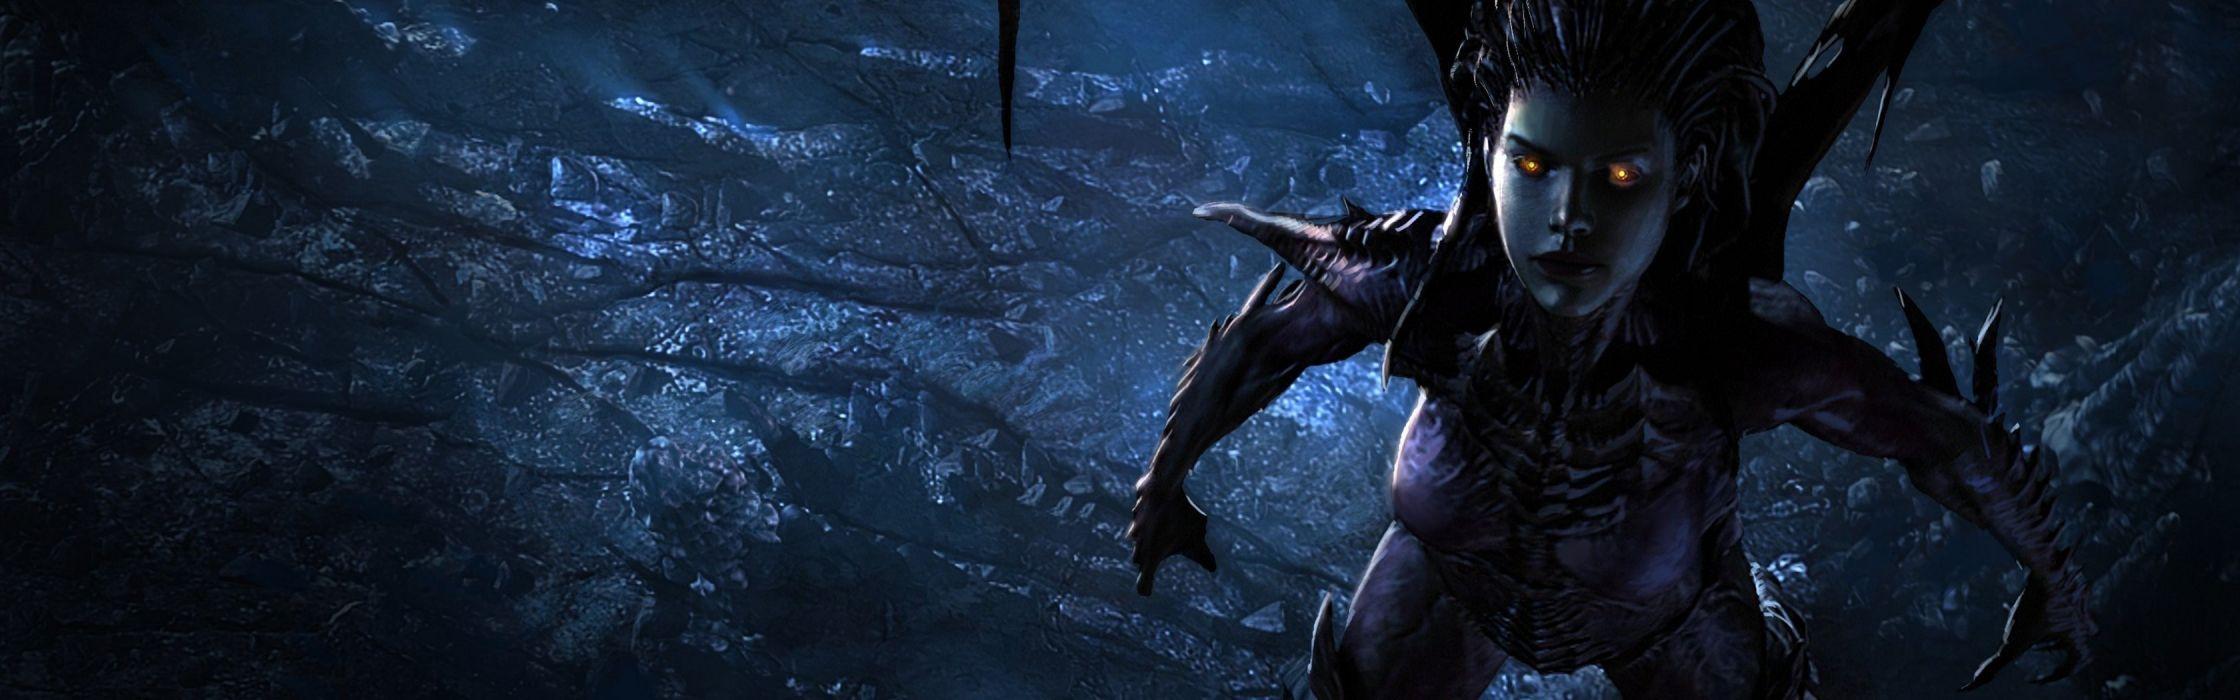 video games CGI StarCraft II wallpaper